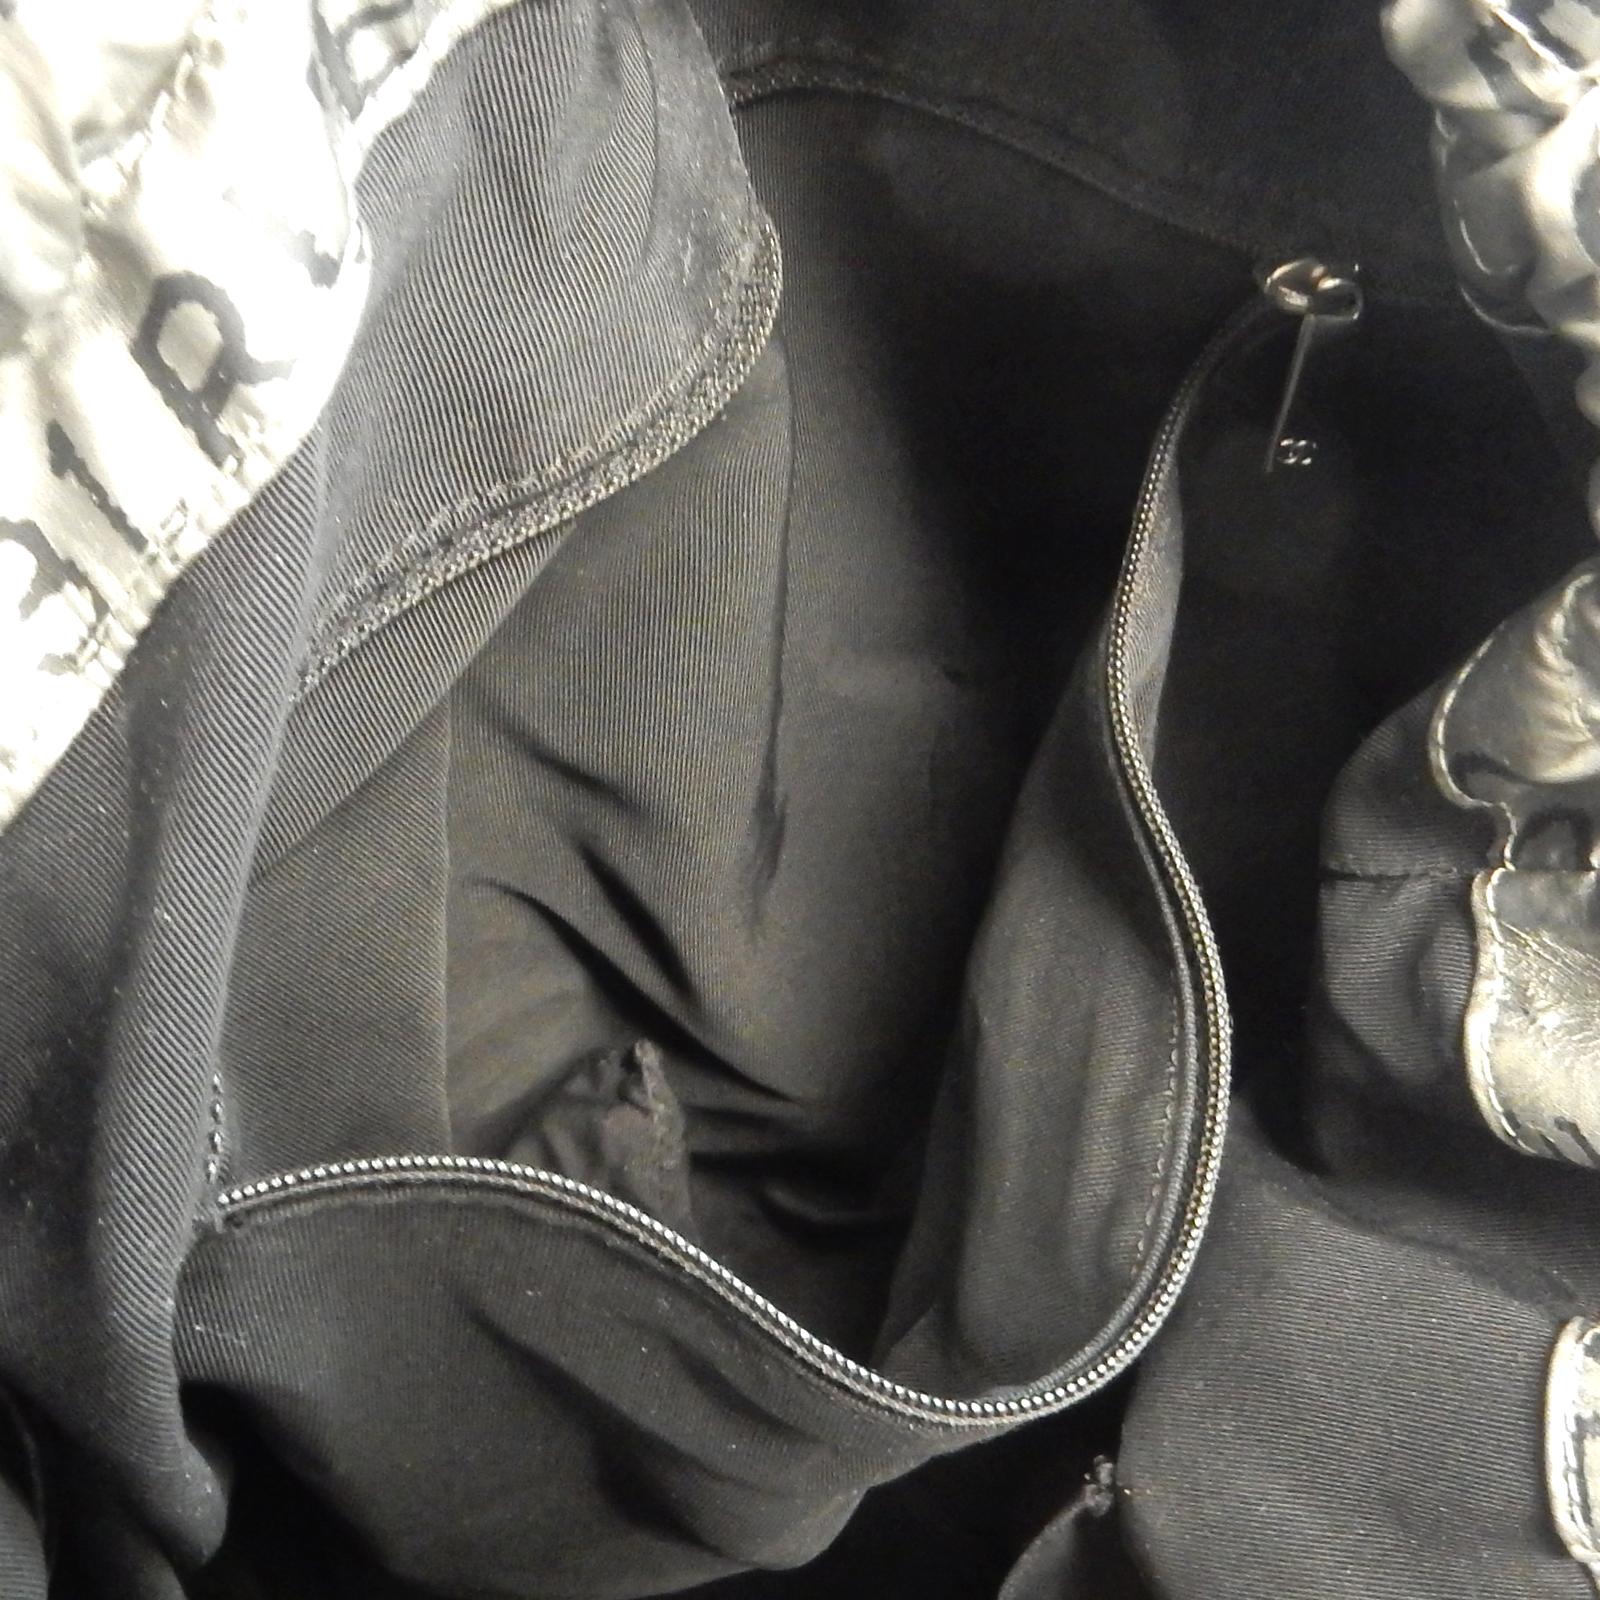 Rise-on CHANEL Unlimited Nylon Silver DRAWSTRING Tote bag Shoulder ... 9b498318ae